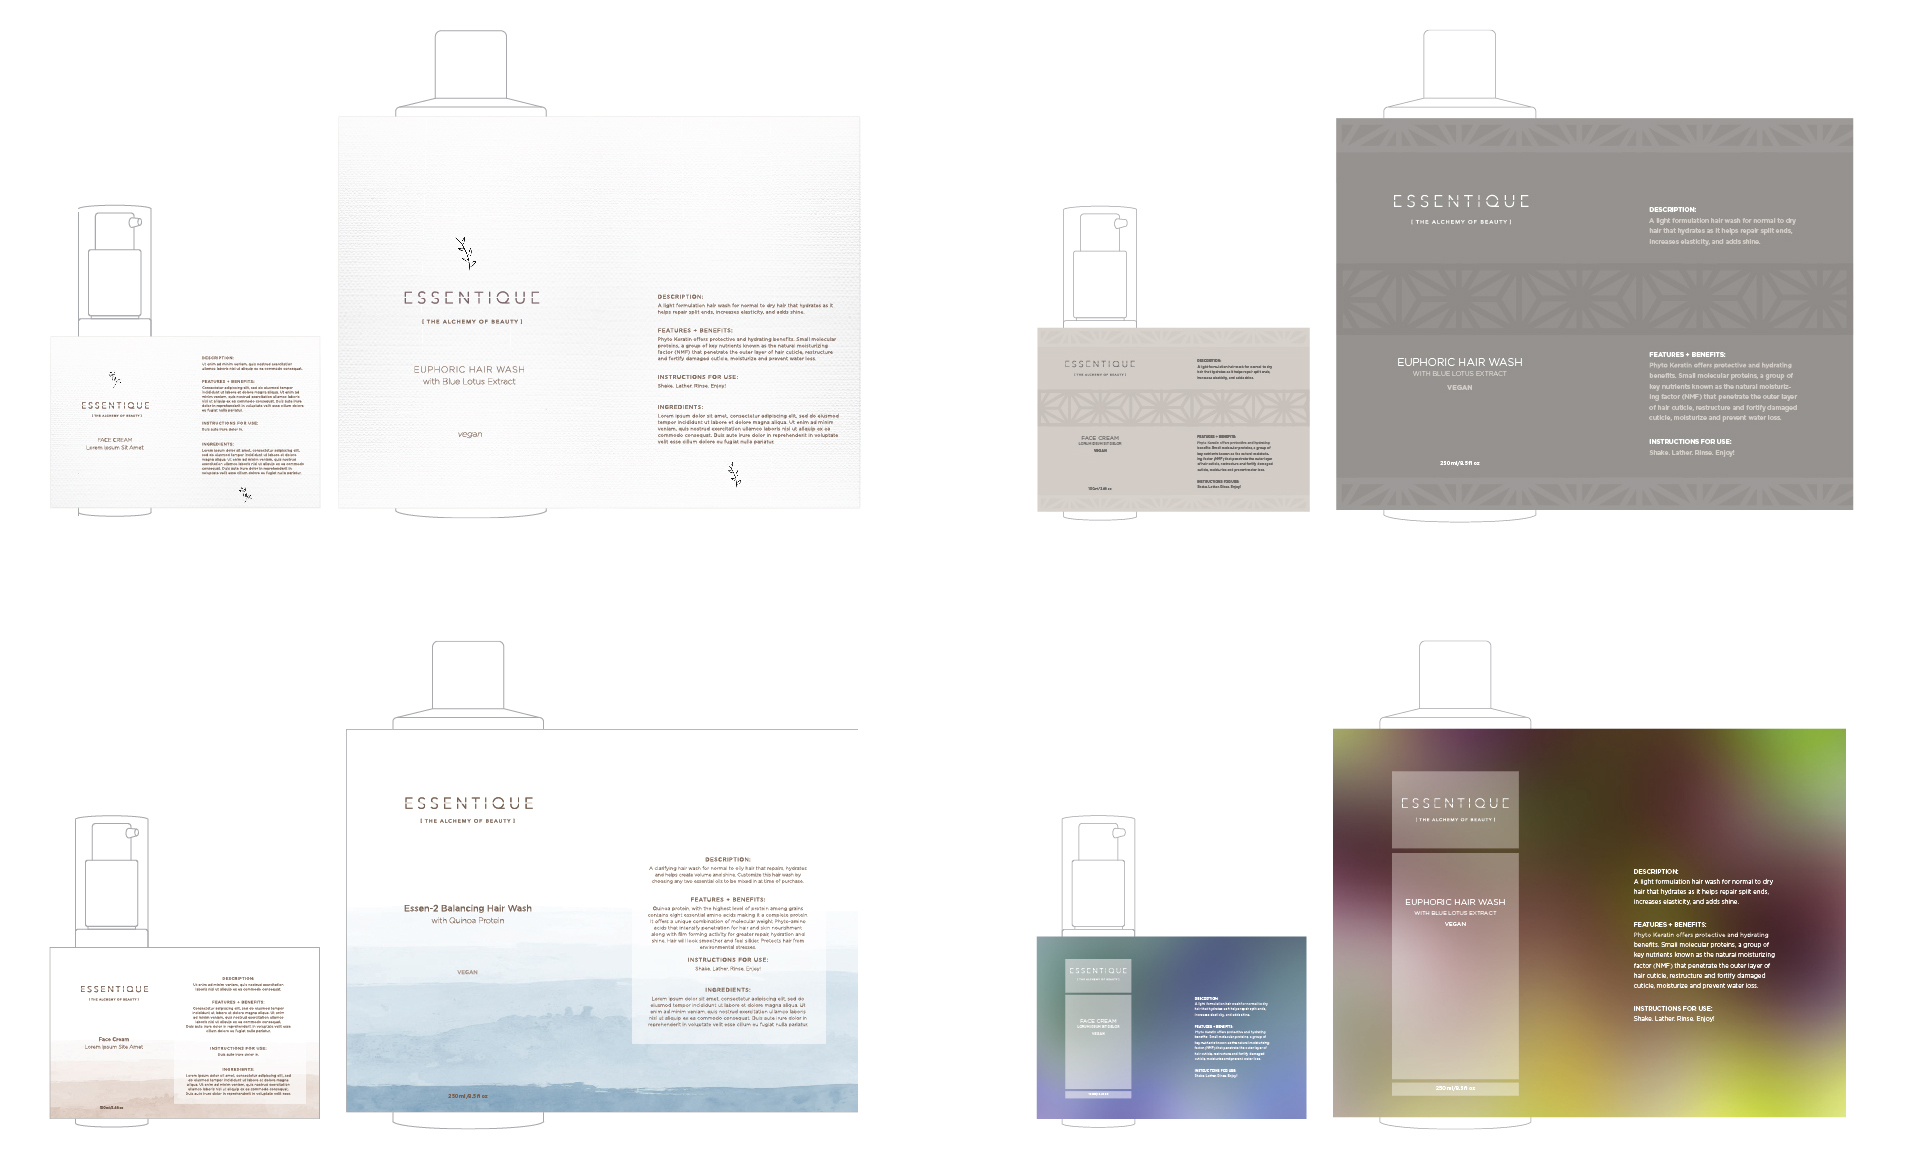 Essentique_Packaging_Explorations-01.jpg